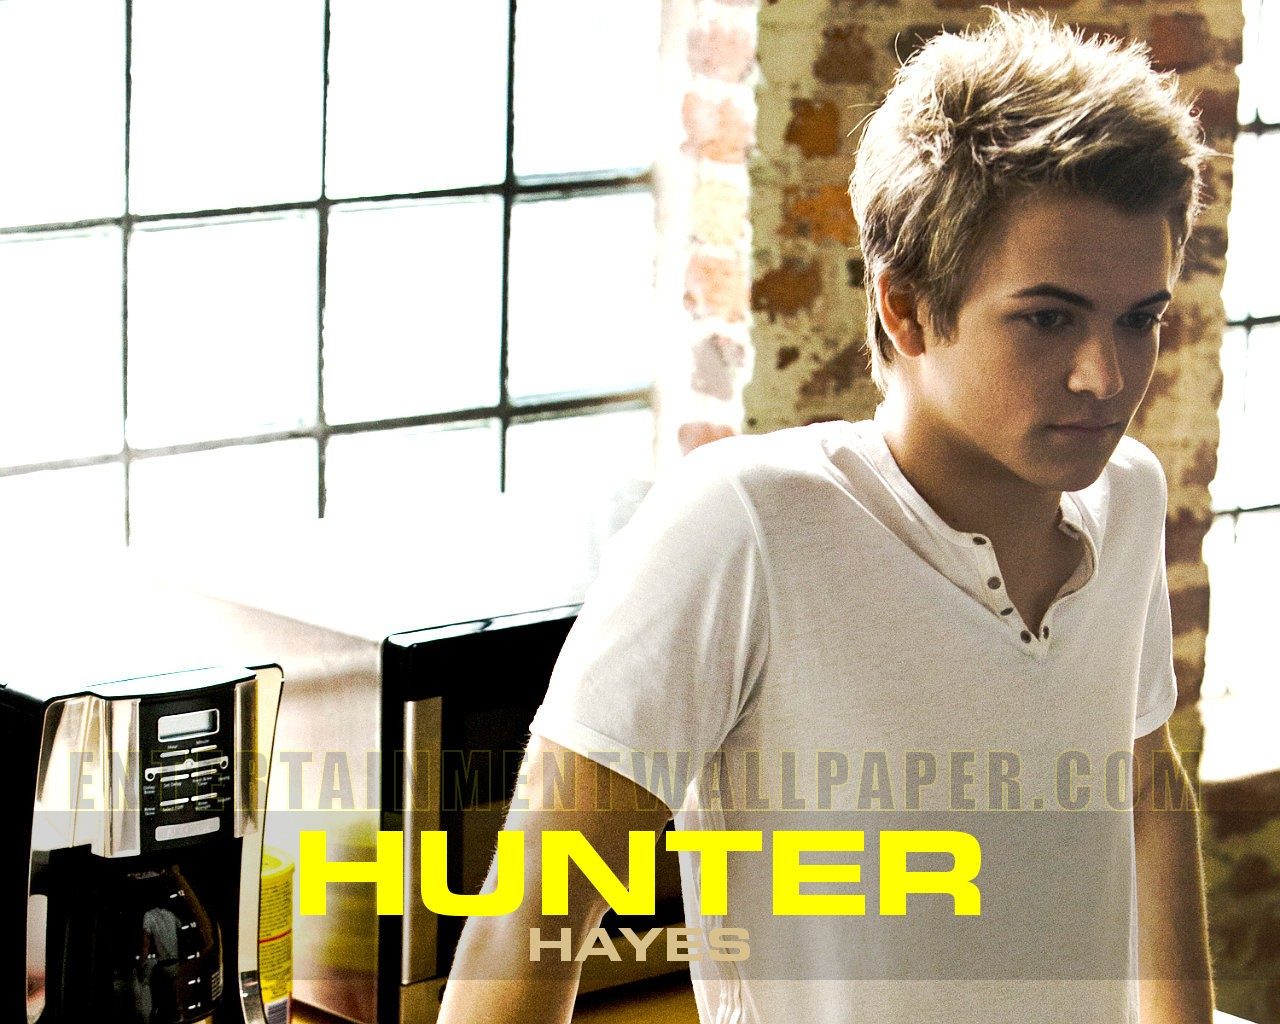 Hunter Hayes Wallpaper Hunter Hayes images Hu...